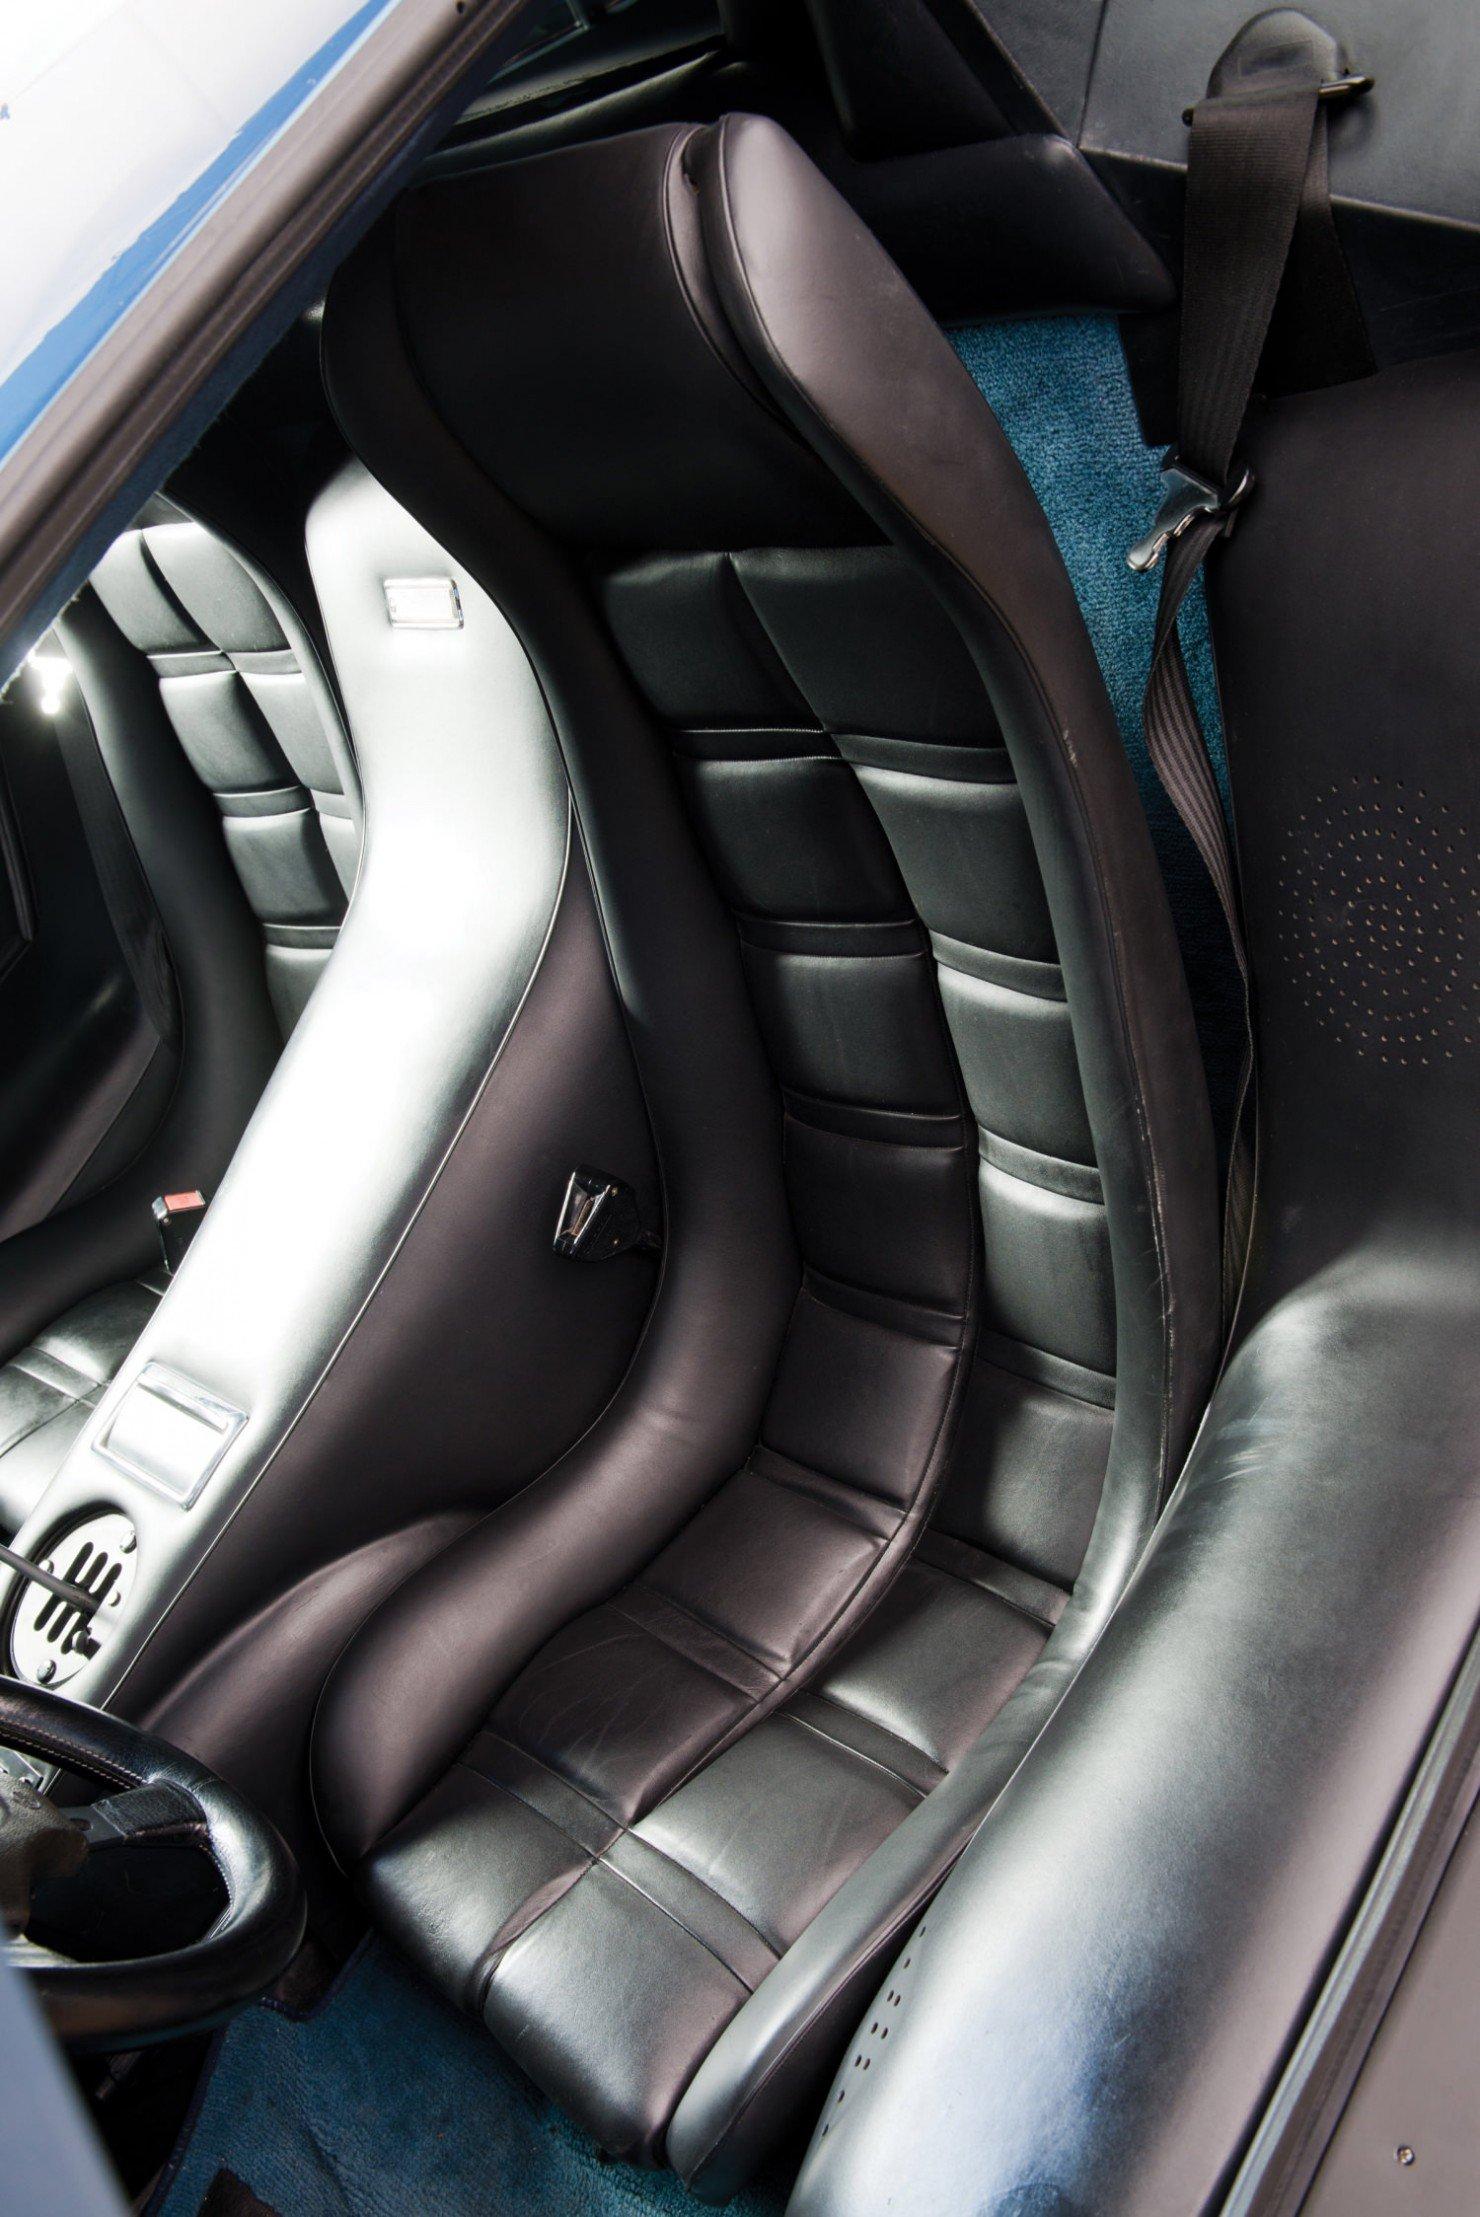 Lamborghini-Countach-LP400S-19